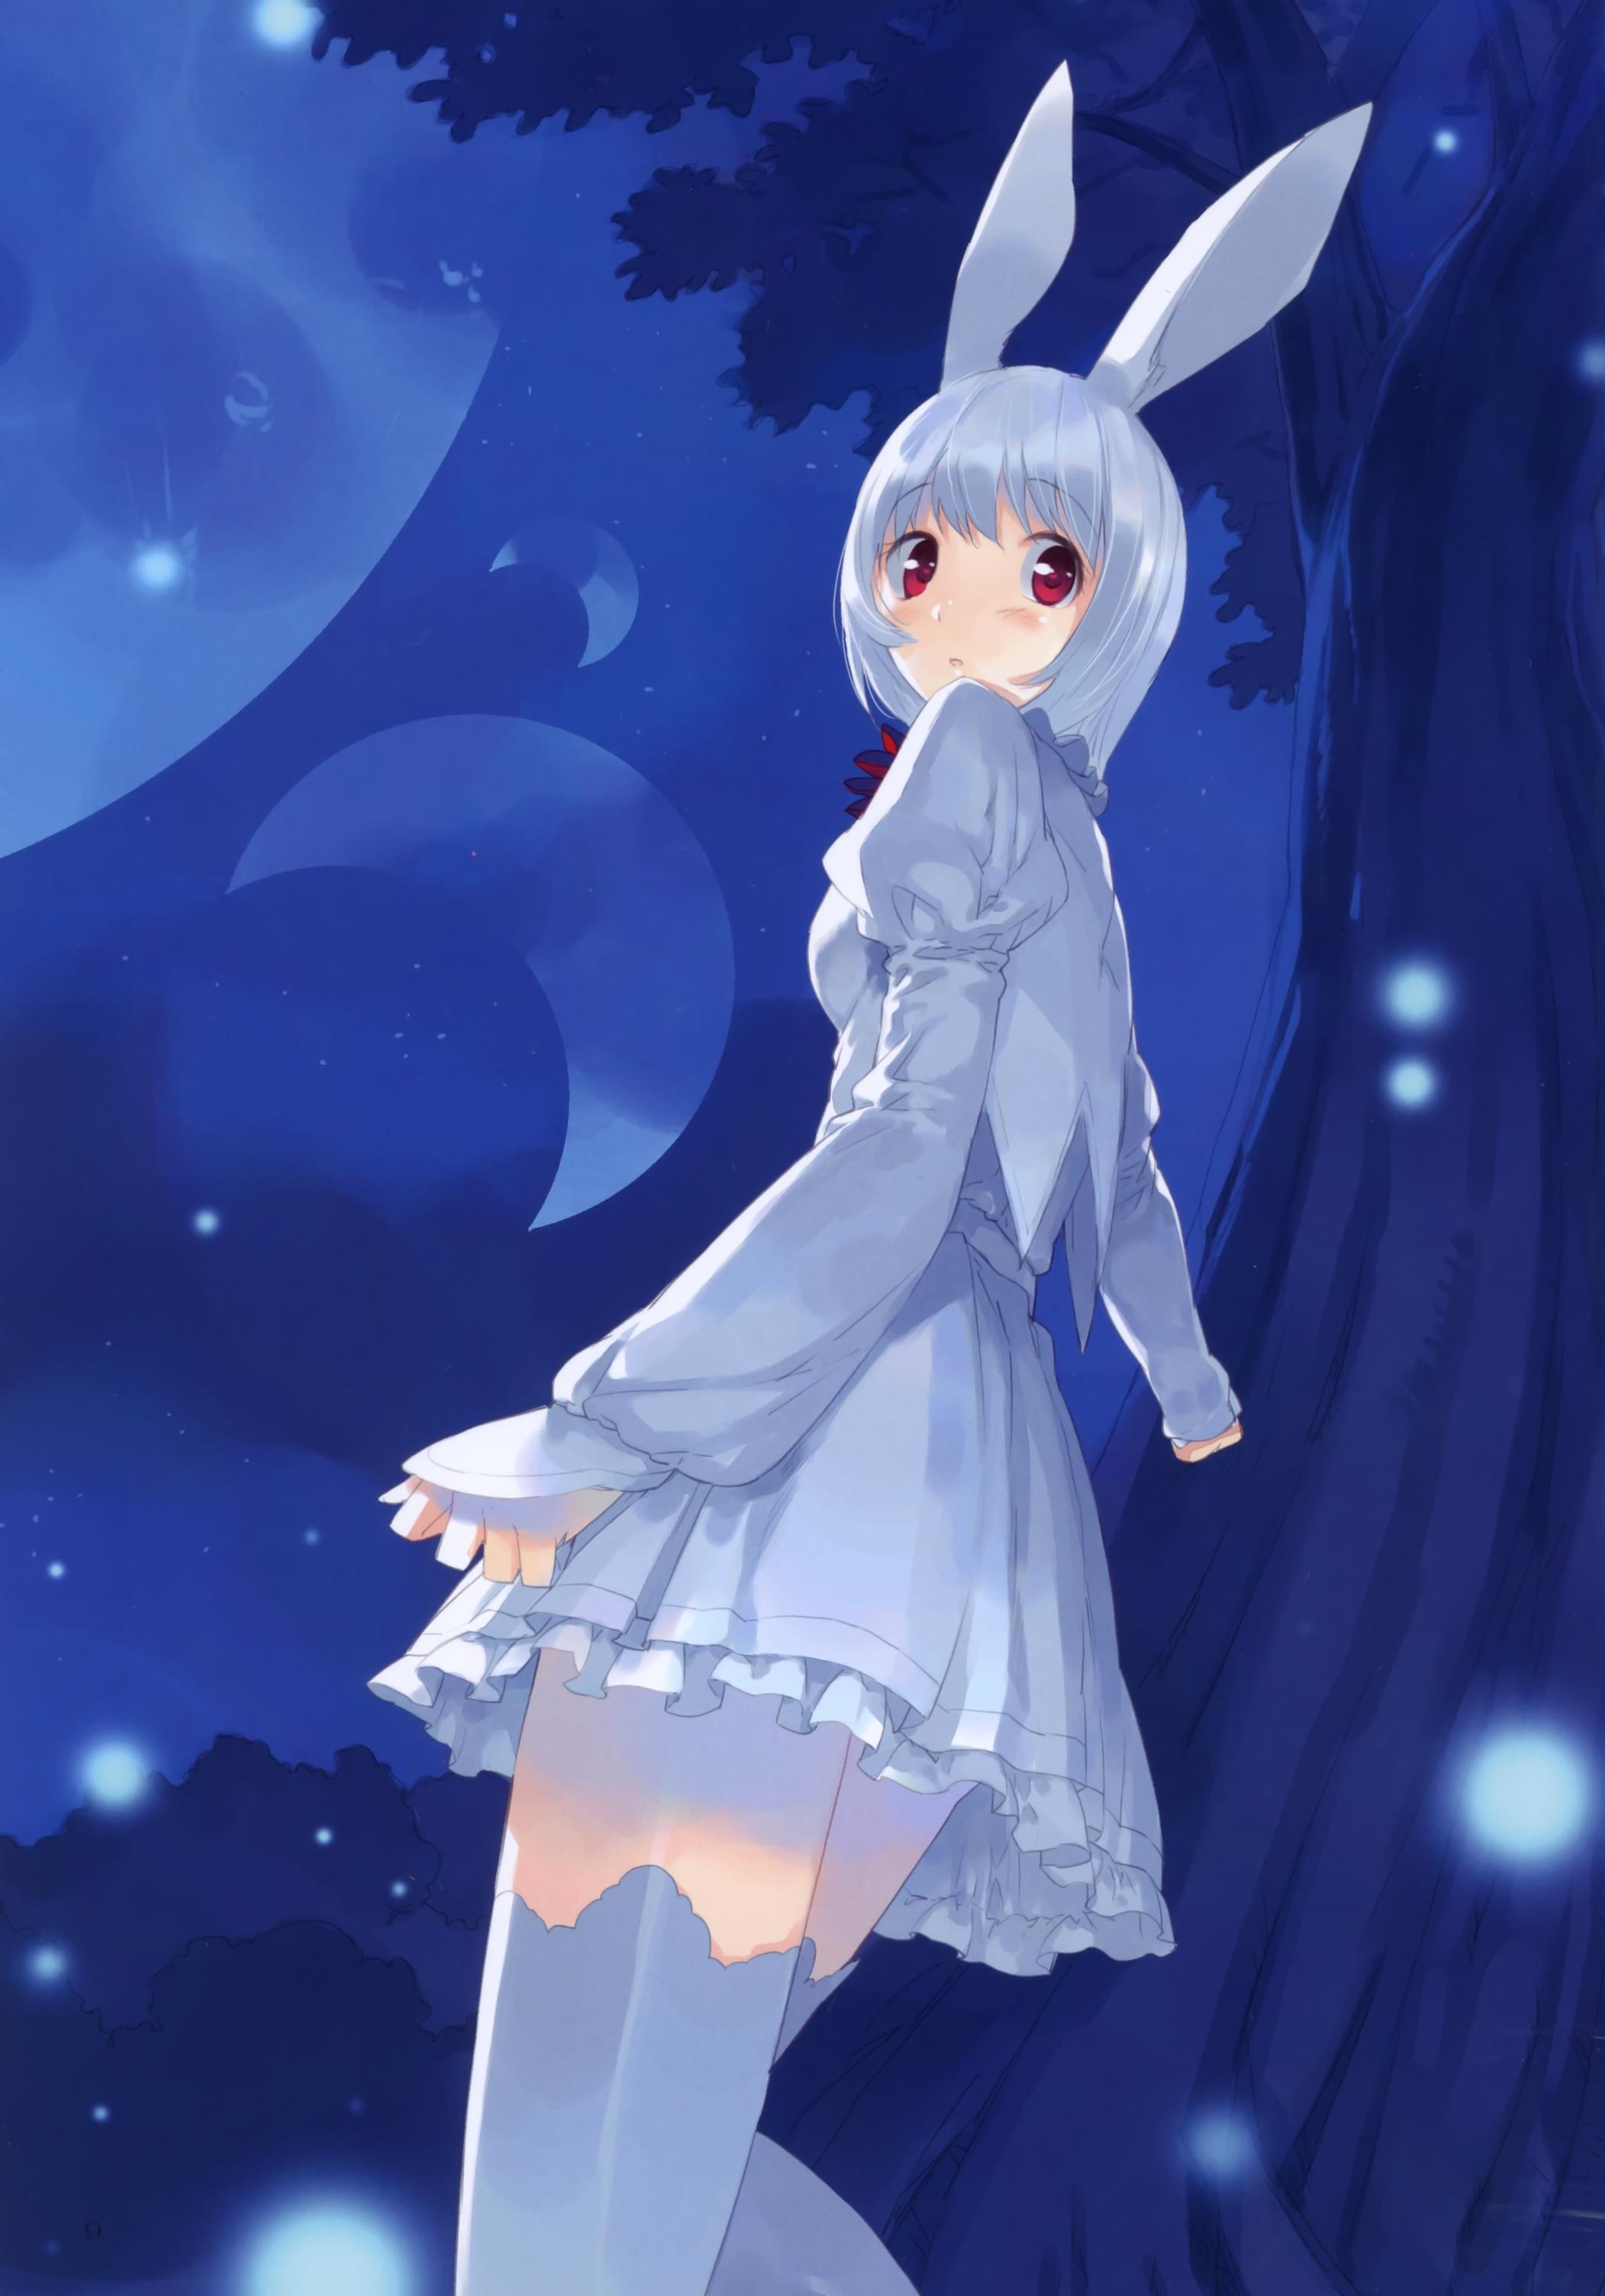 March hare alice in wonderland zerochan anime image board for March hare wallpaper